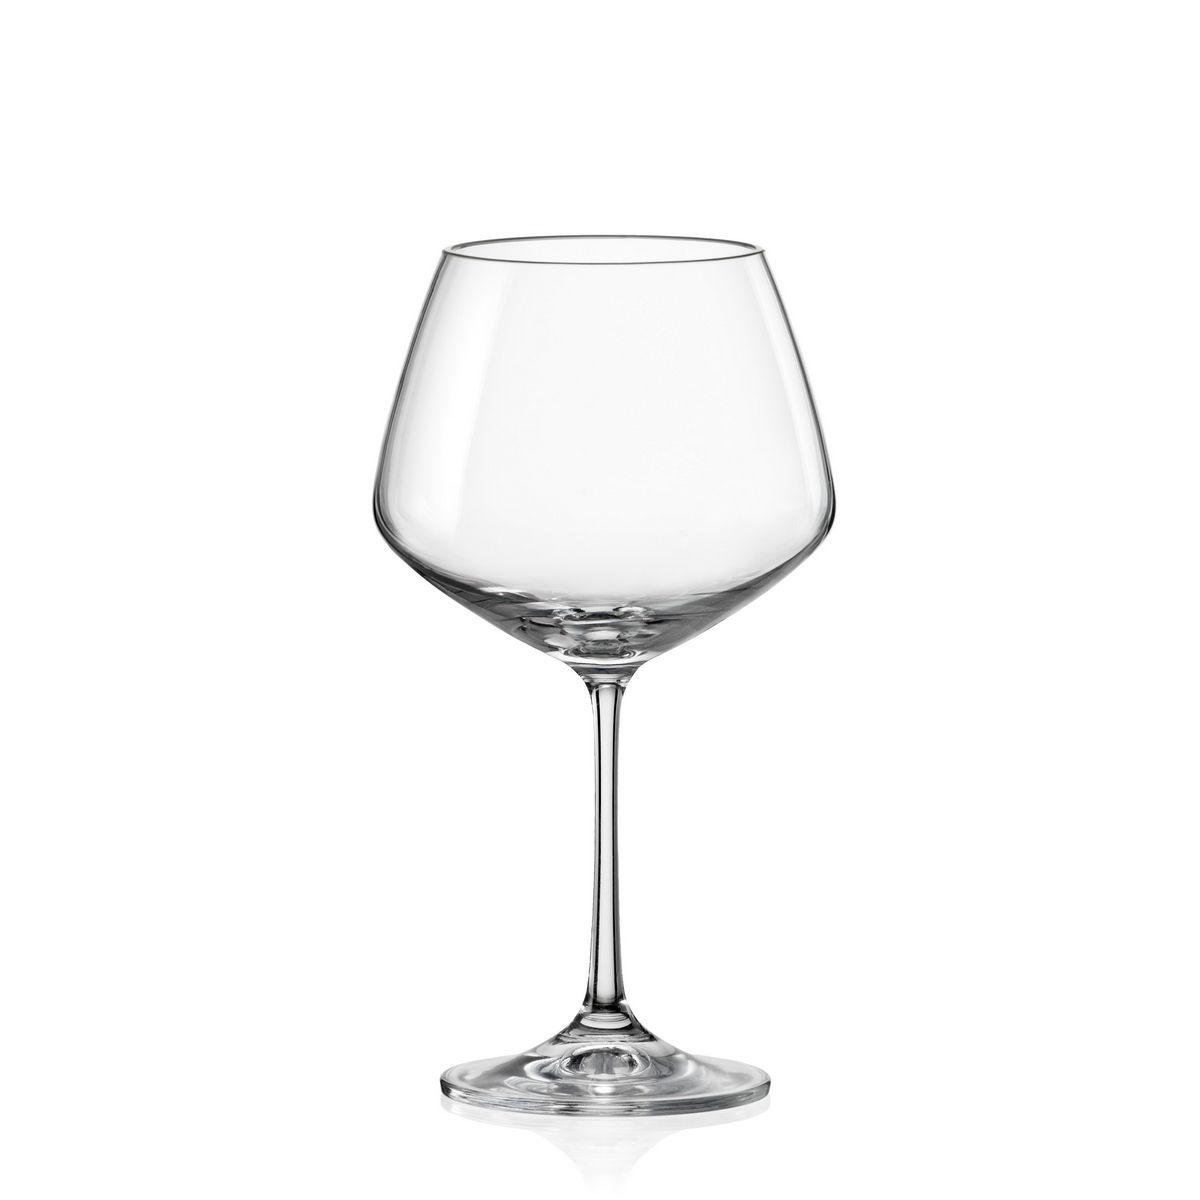 GISELLE Set 6 pahare cristalin vin 580 ml